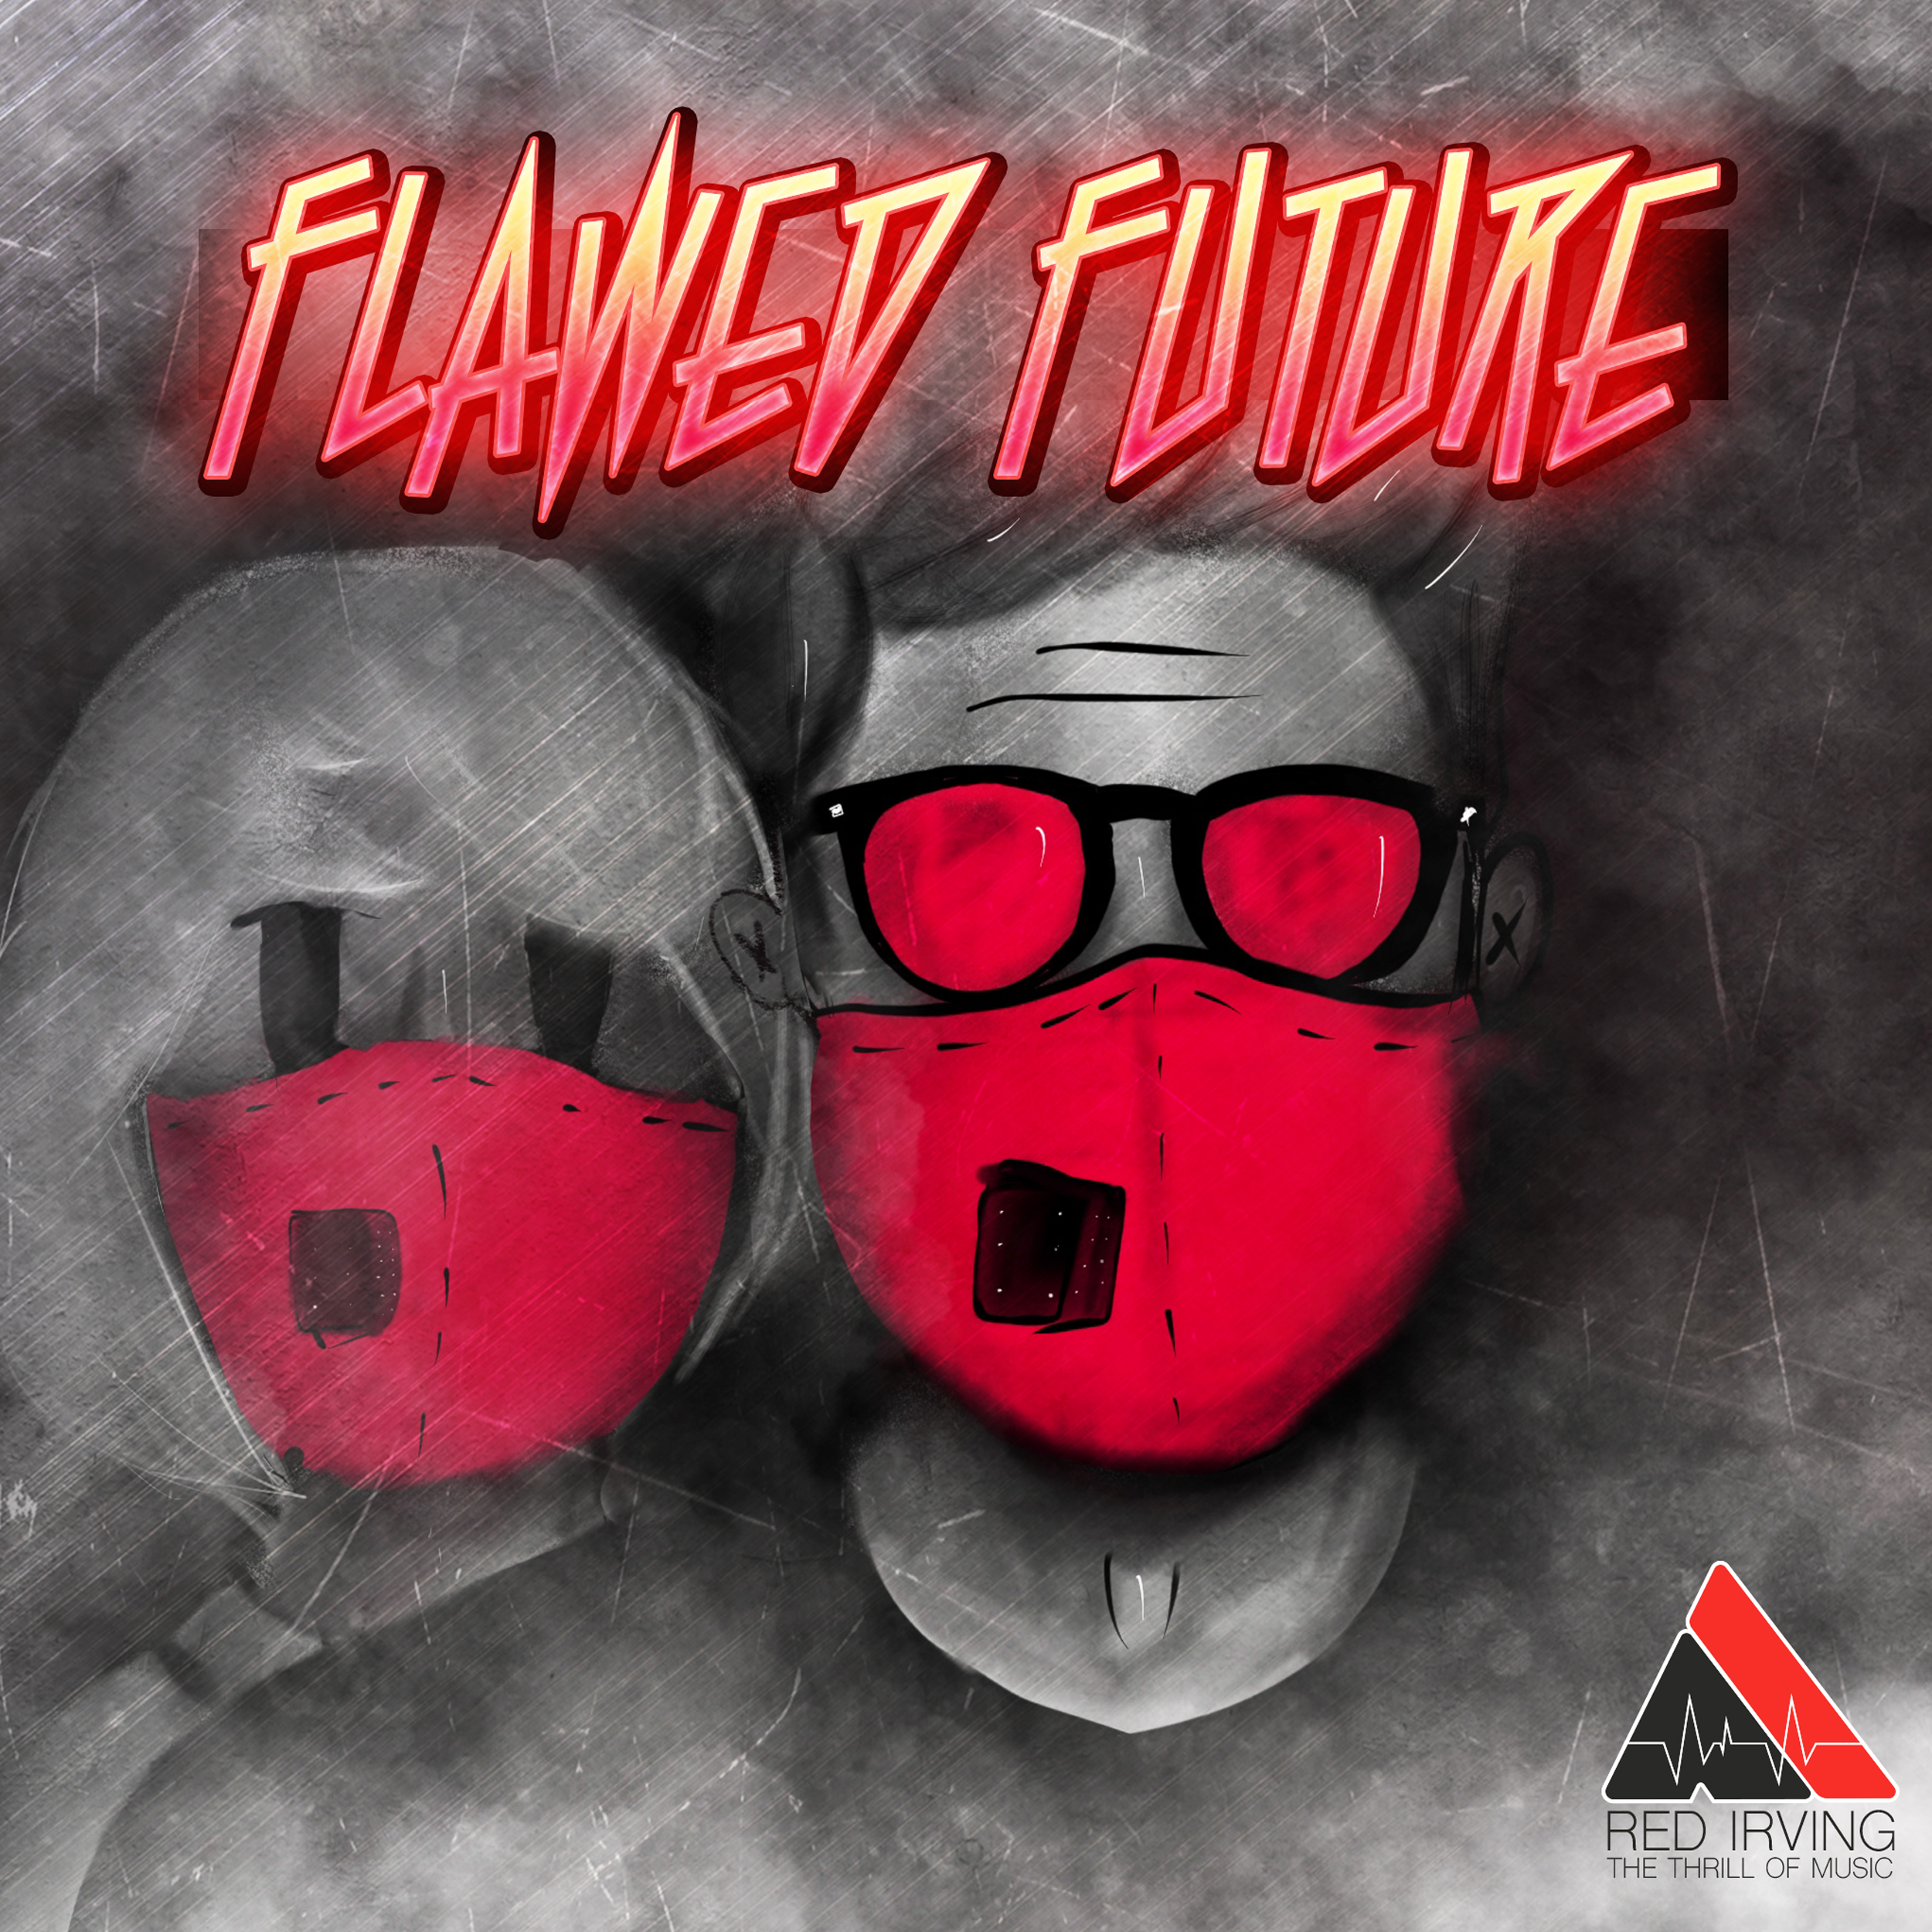 Flawed Future